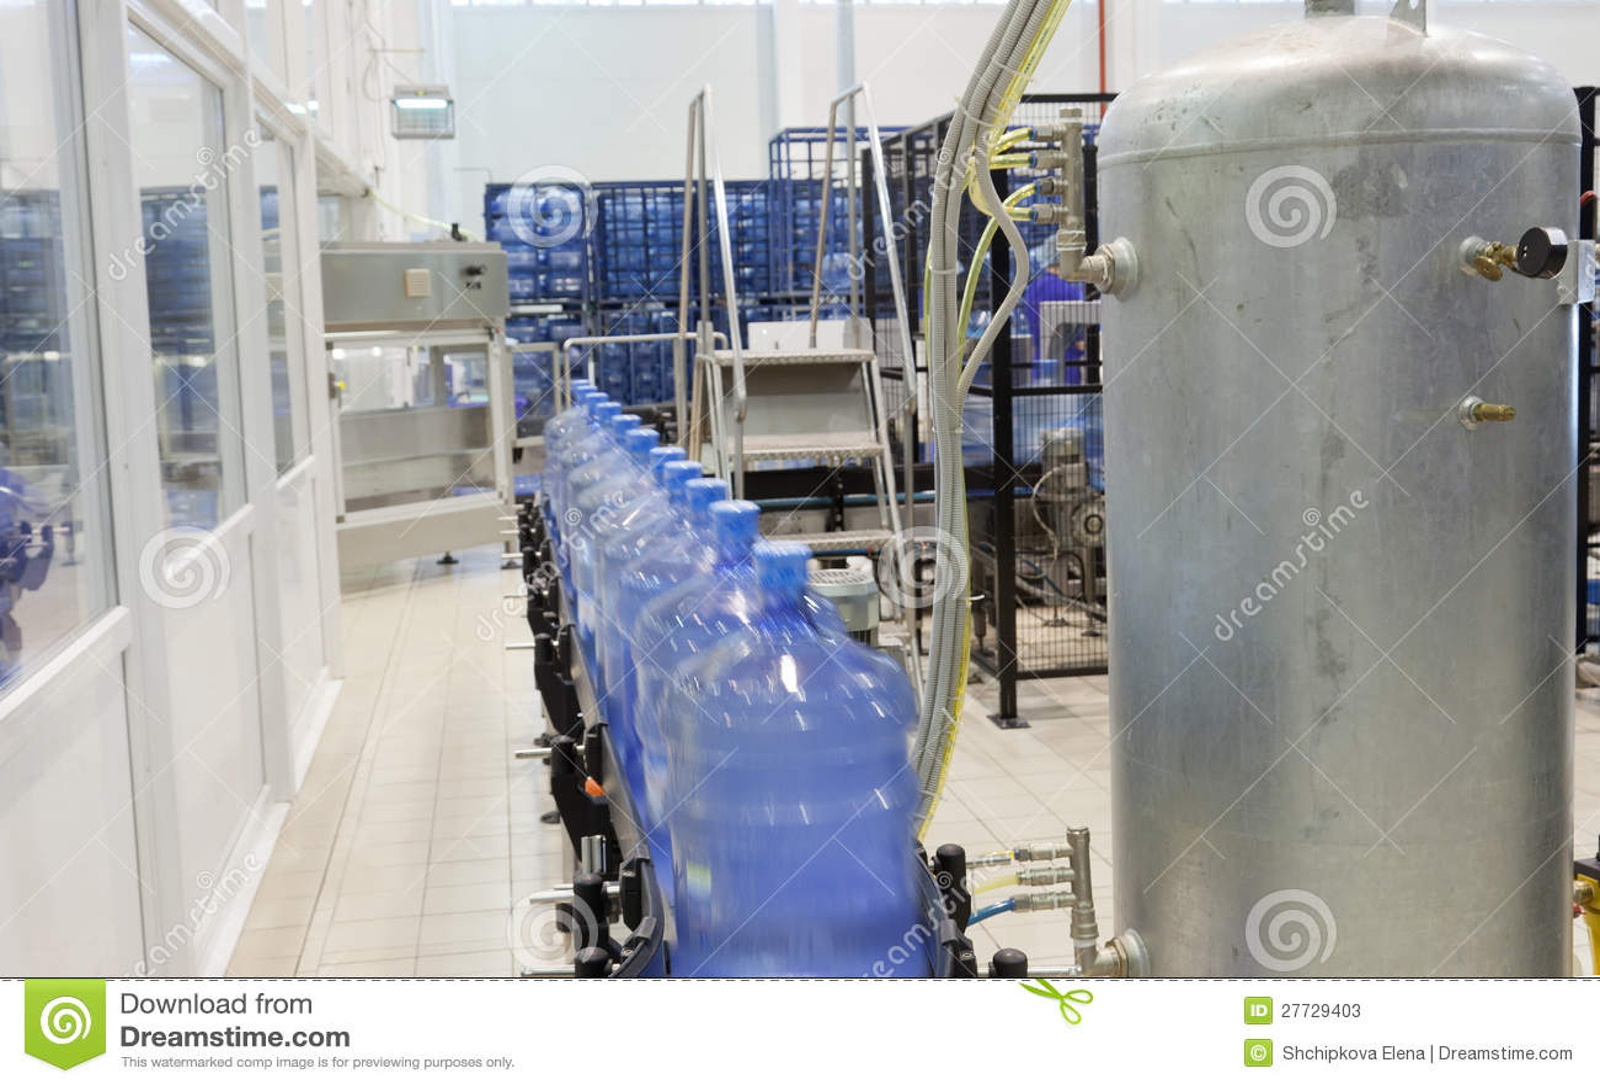 Modernes industrielles System